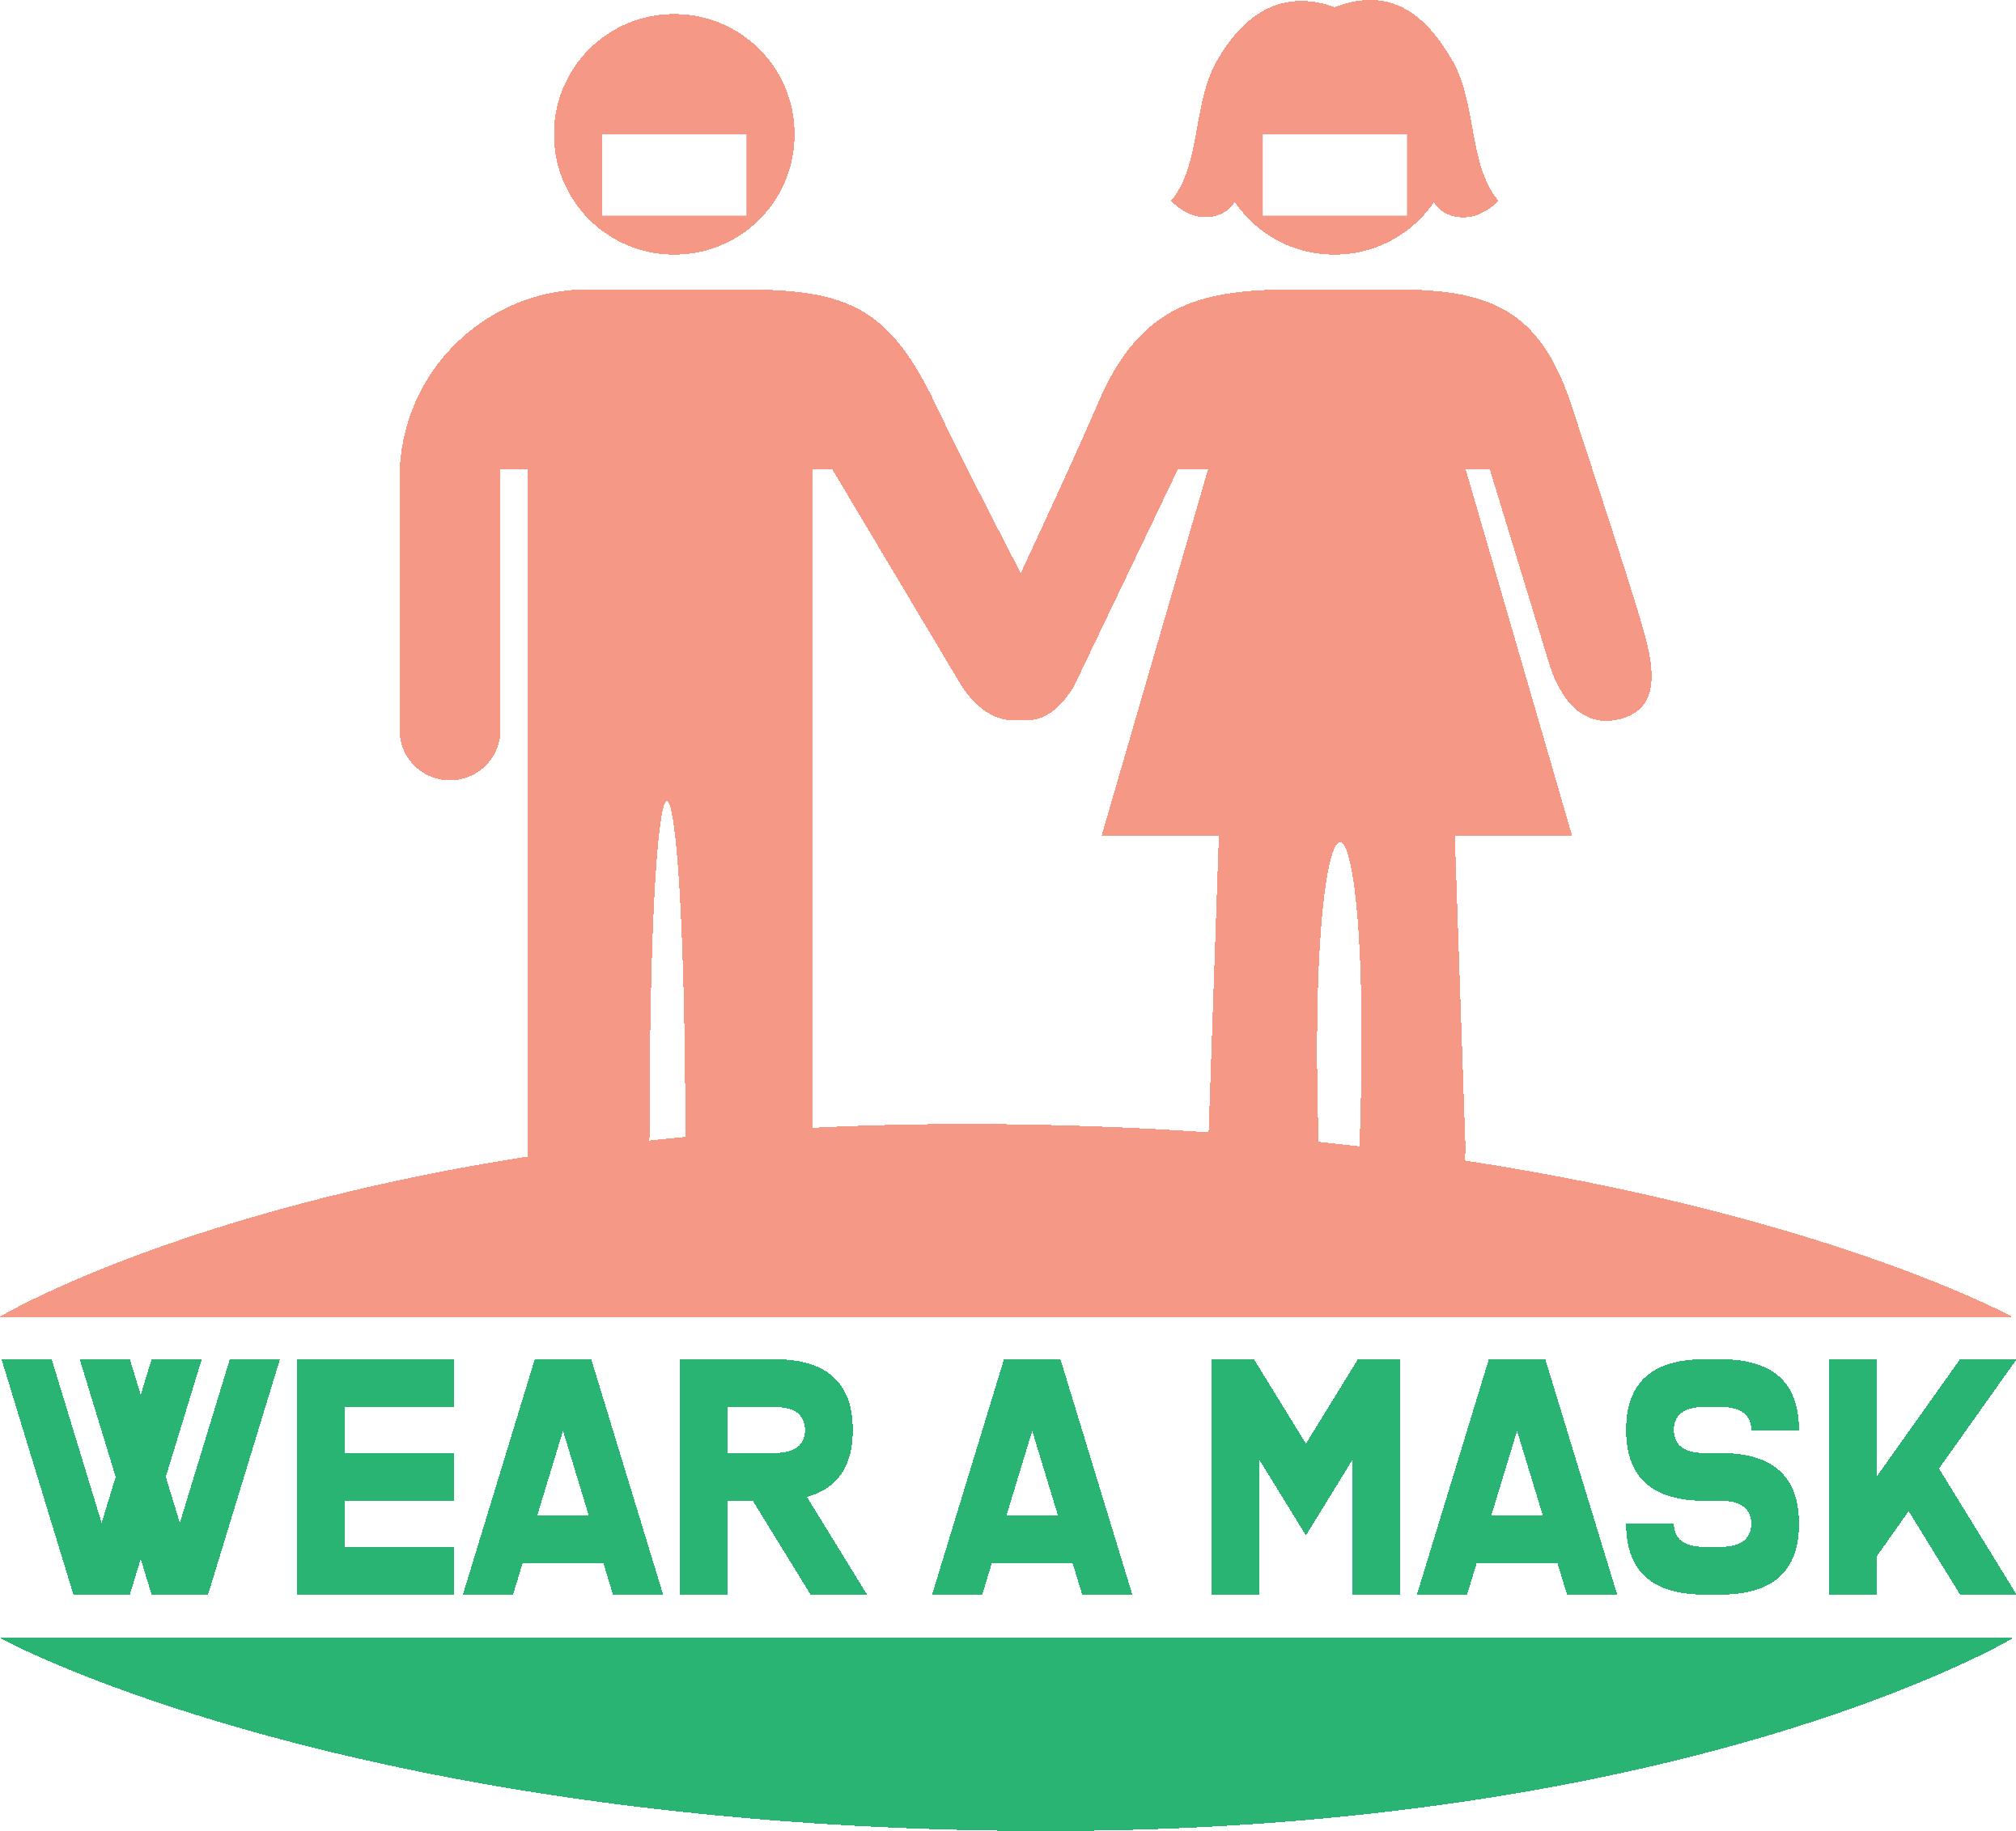 Wear A Mask Coronavirus Disease covid-19 Free DXF File